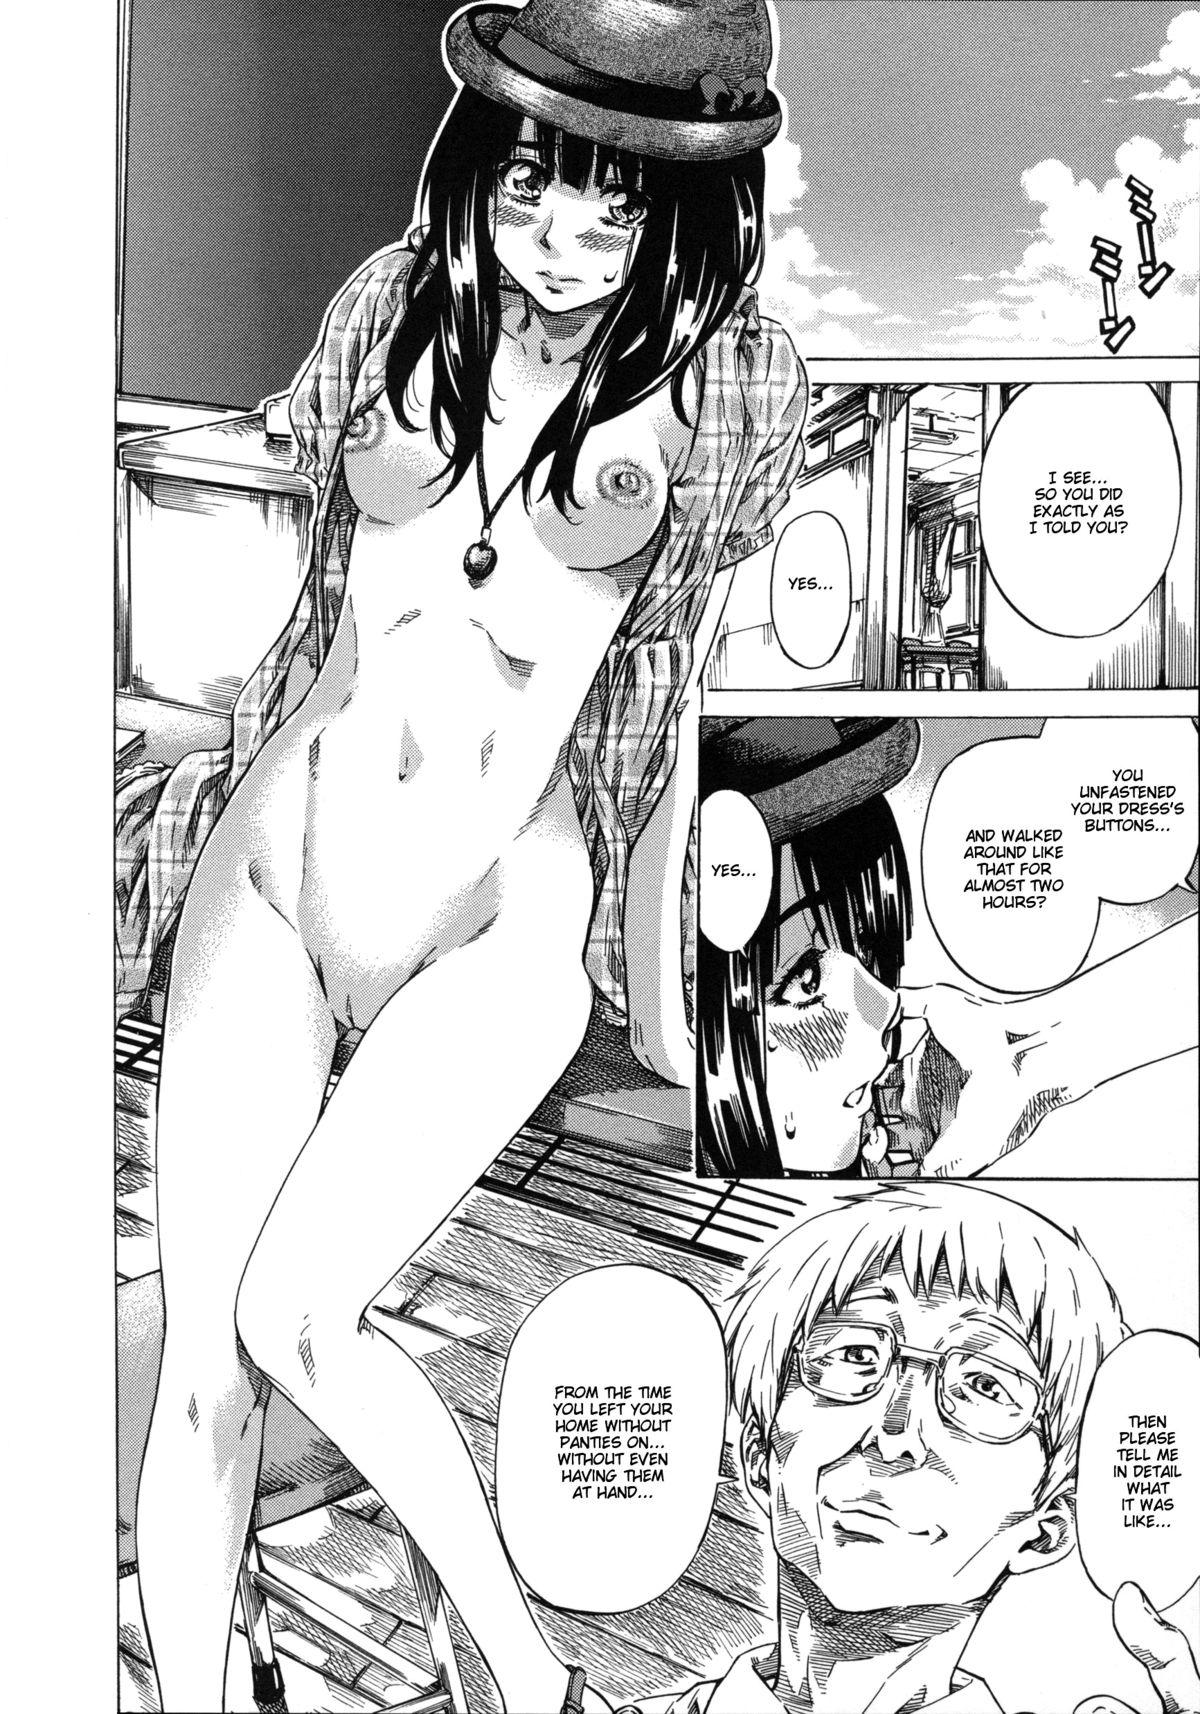 Kashiwazaki Miki wa Ironna Basho de Zenra Sanpo Shitemita   Miki Kashiwazaki Goes Naked in All Sorts of Places Ch. 1-4 13